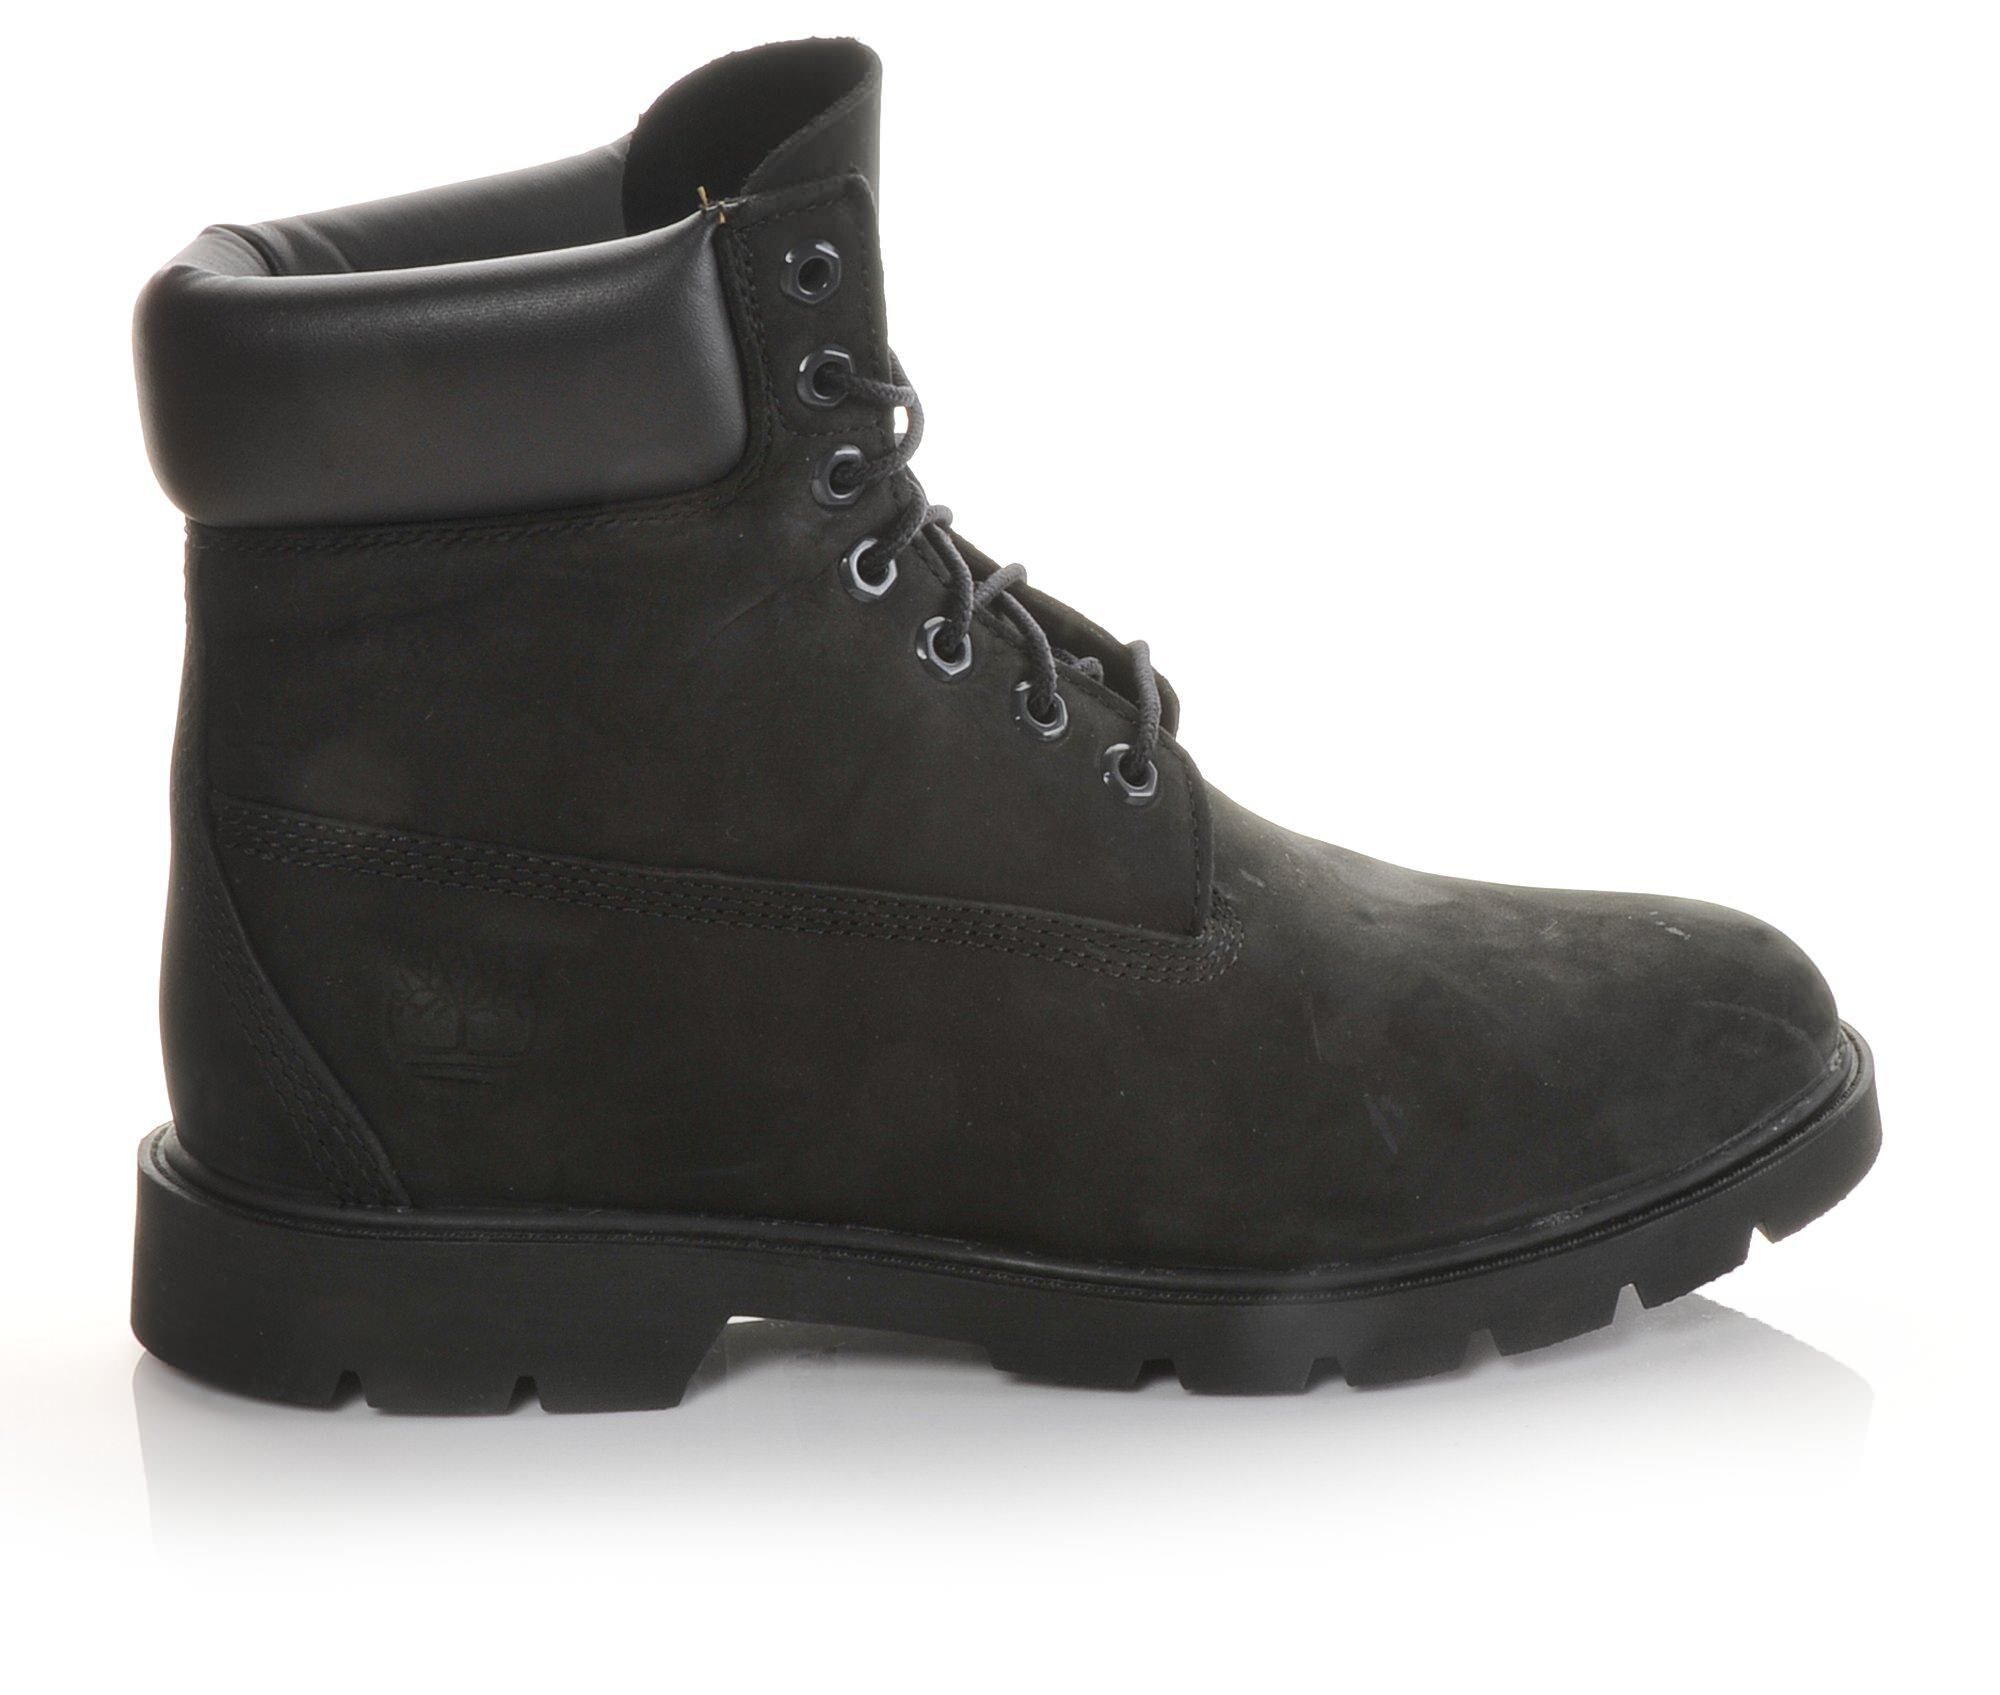 Timberland Bootsamp; Timberland Bootsamp; ShoesMen'sWomen'sKids' Timberland Bootsamp; ShoesMen'sWomen'sKids' Timberland Bootsamp; Timberland ShoesMen'sWomen'sKids' ShoesMen'sWomen'sKids' OkwiuXTPZ